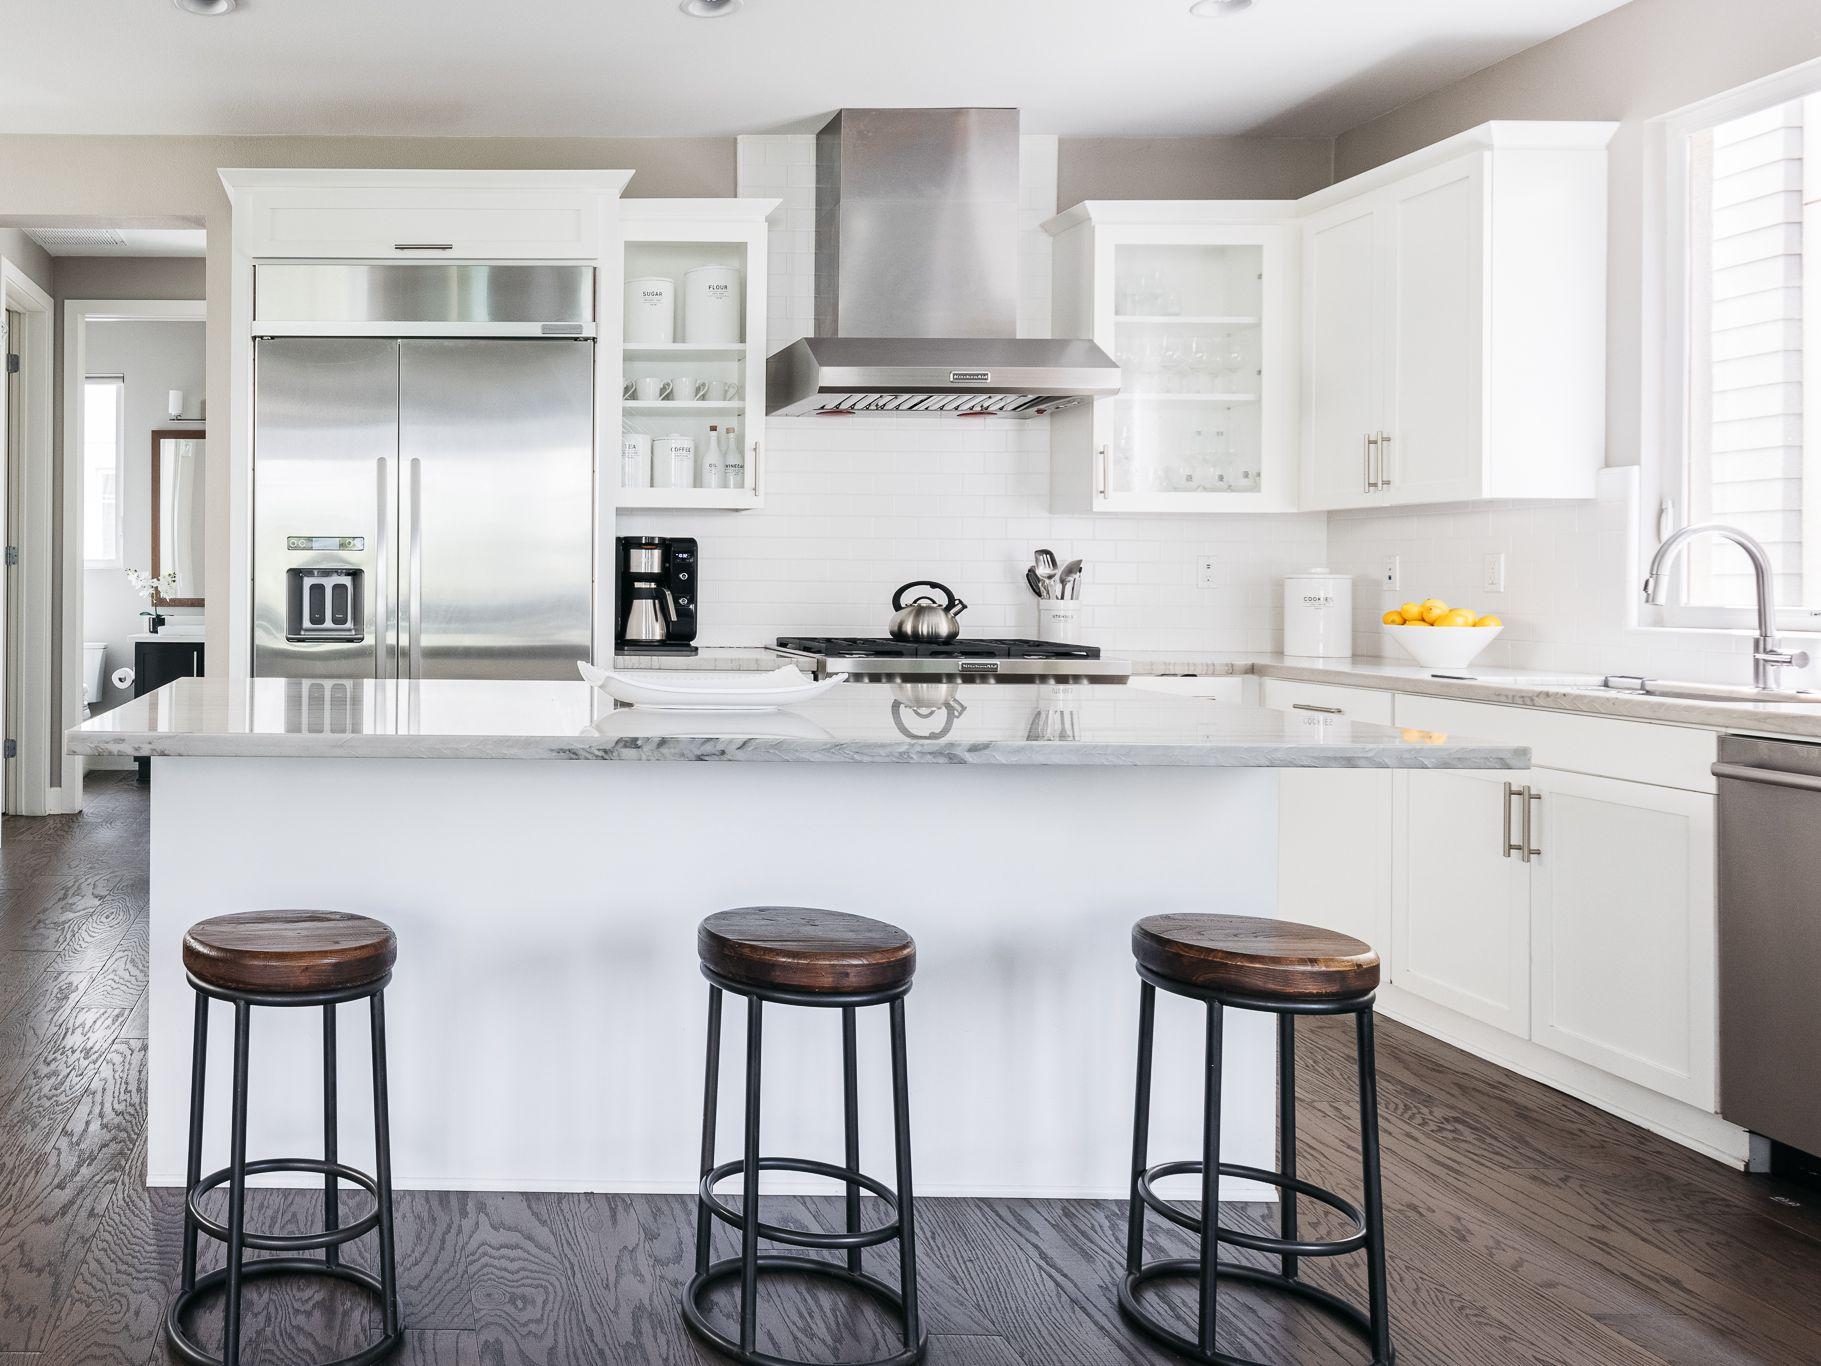 Basic Types Of Kitchen Islands